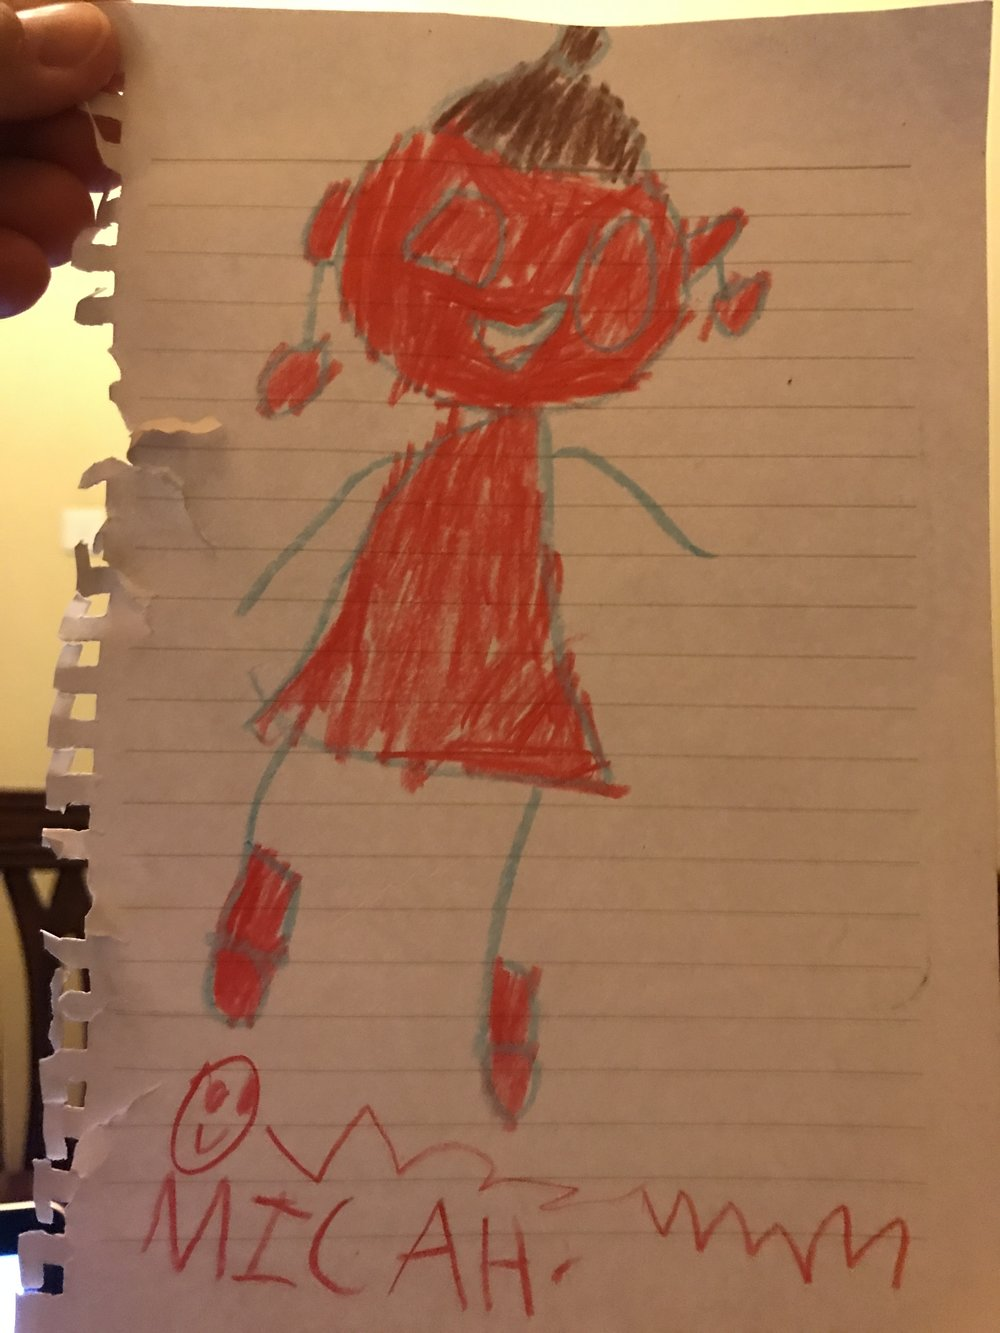 Micah's drawing of me